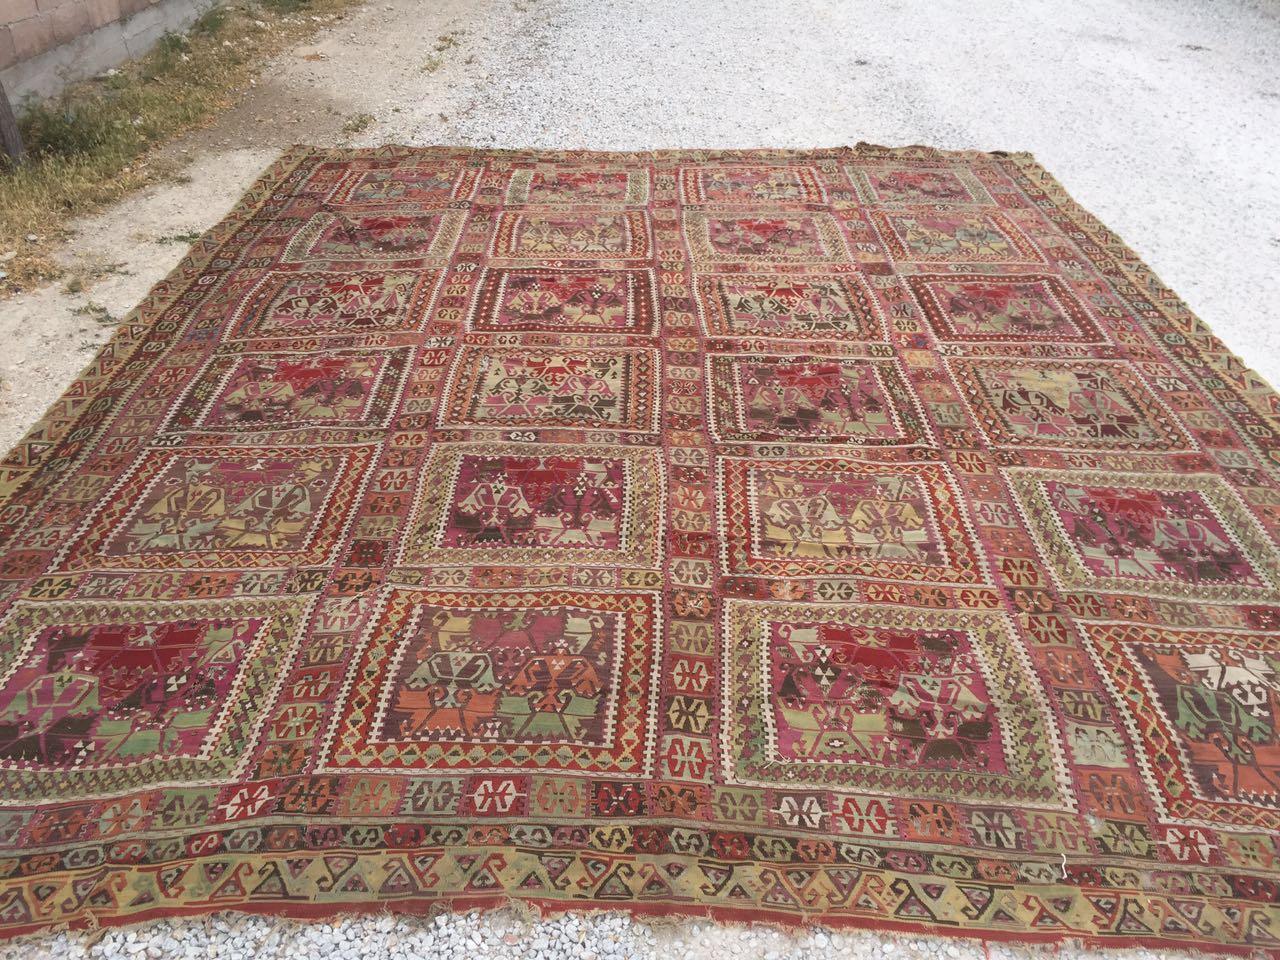 13125 Antique Anatolian kilim rug (1)